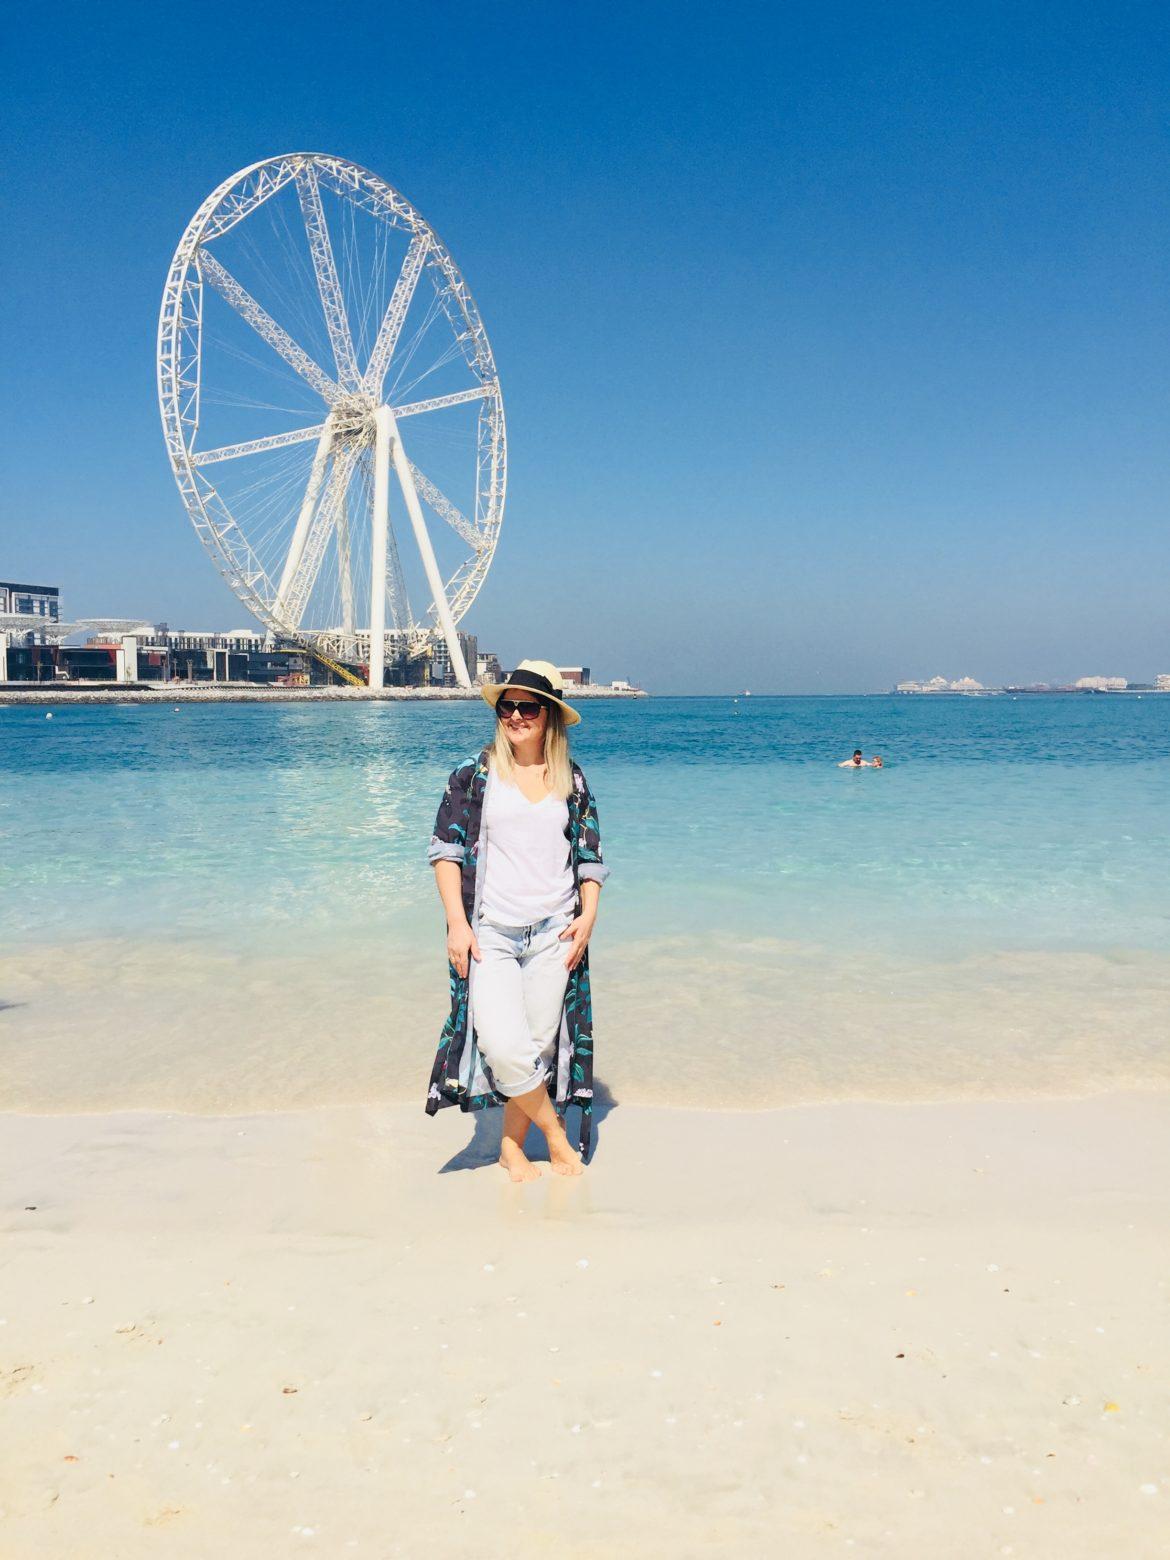 Me wearing H&M on Jumeirah Beach